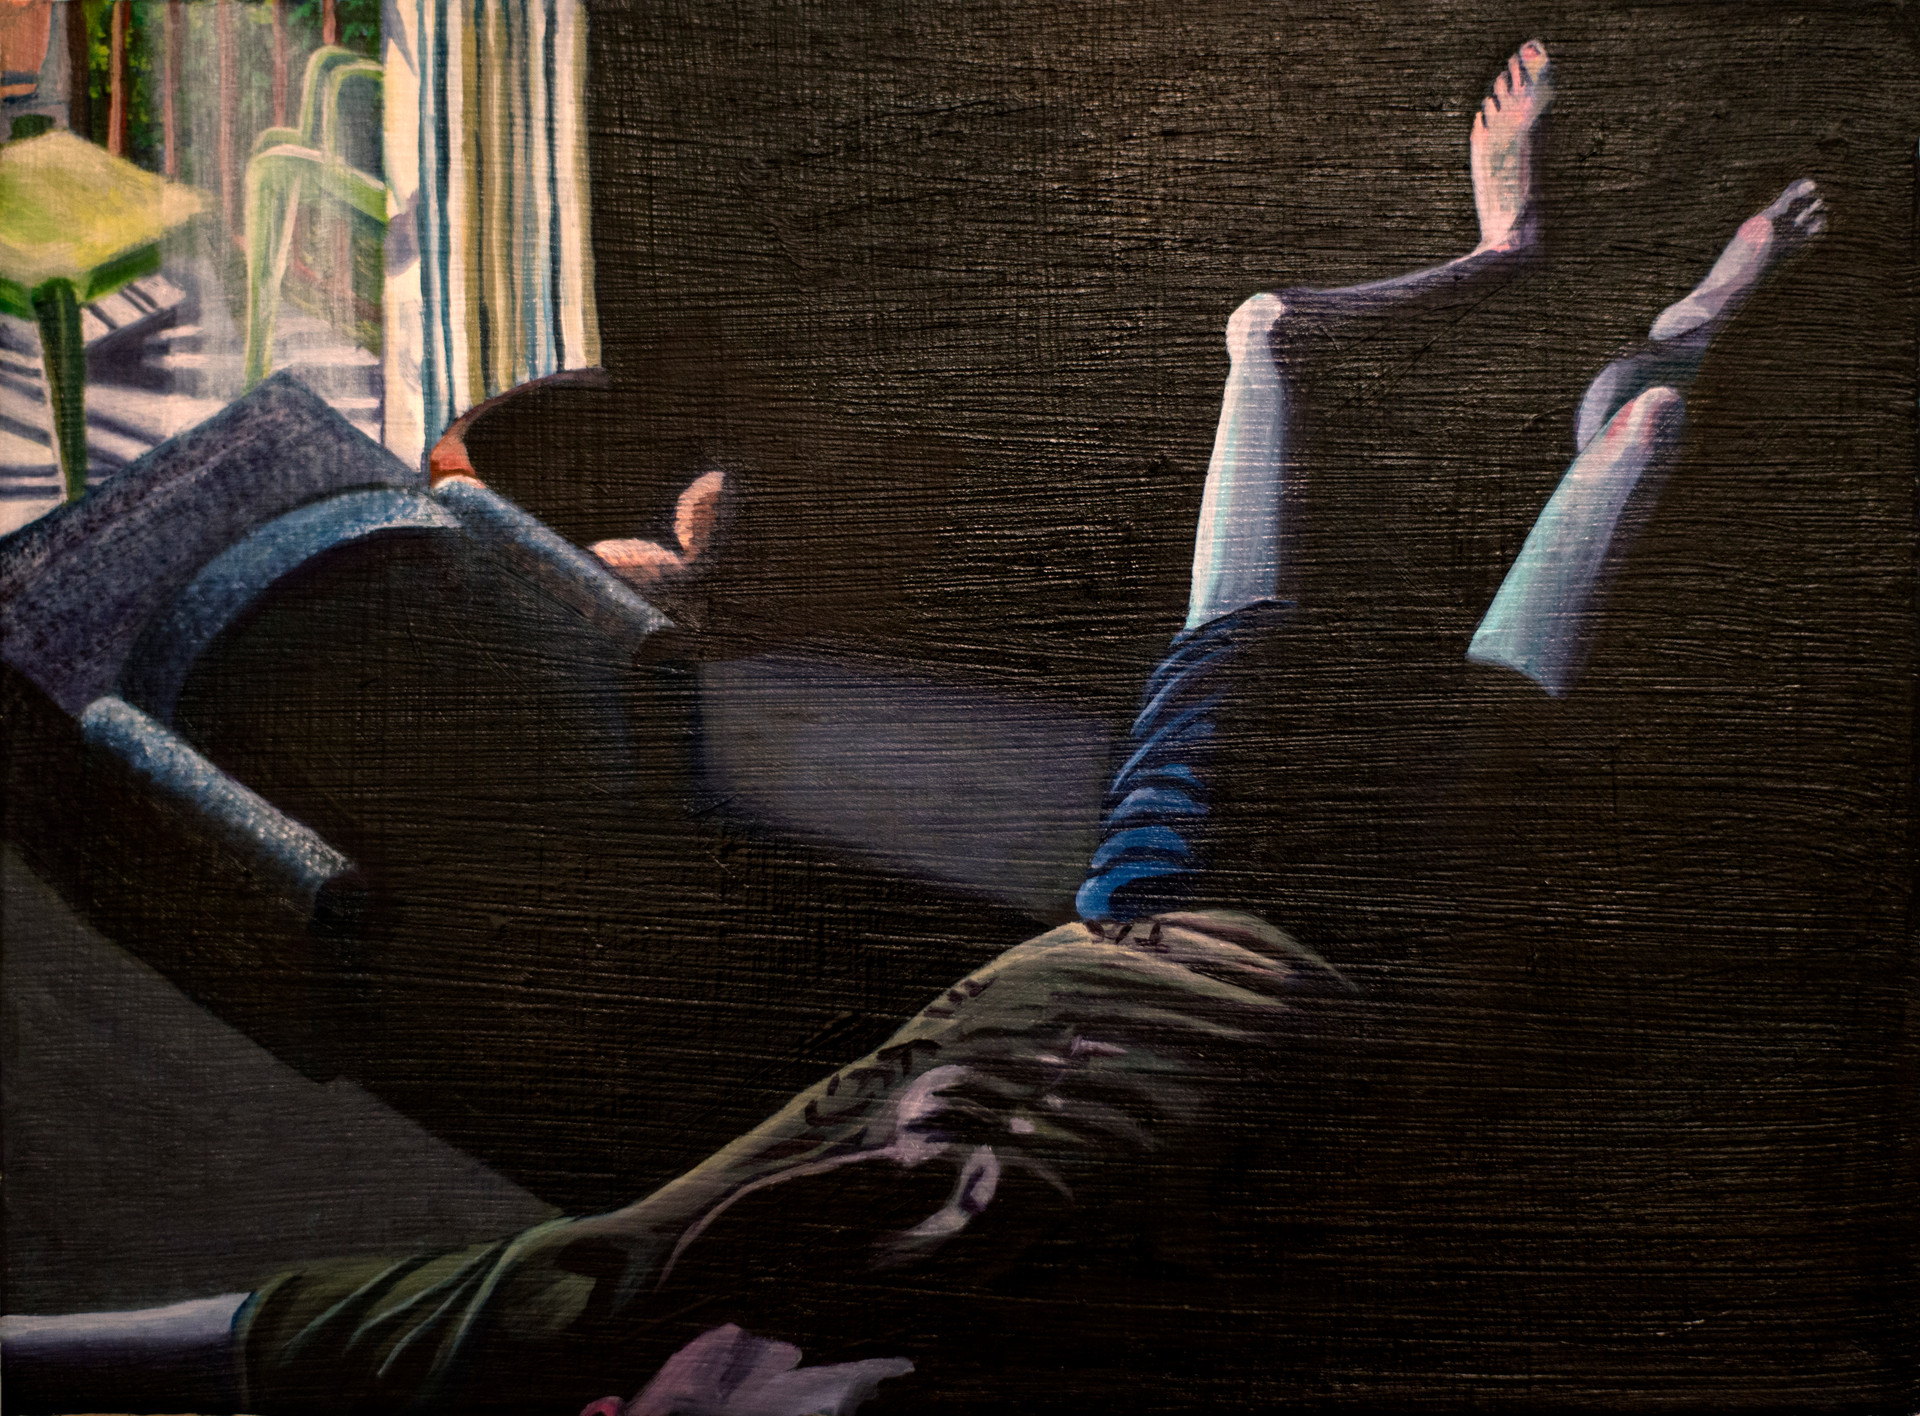 Untitled (Cat Beds, Dan)